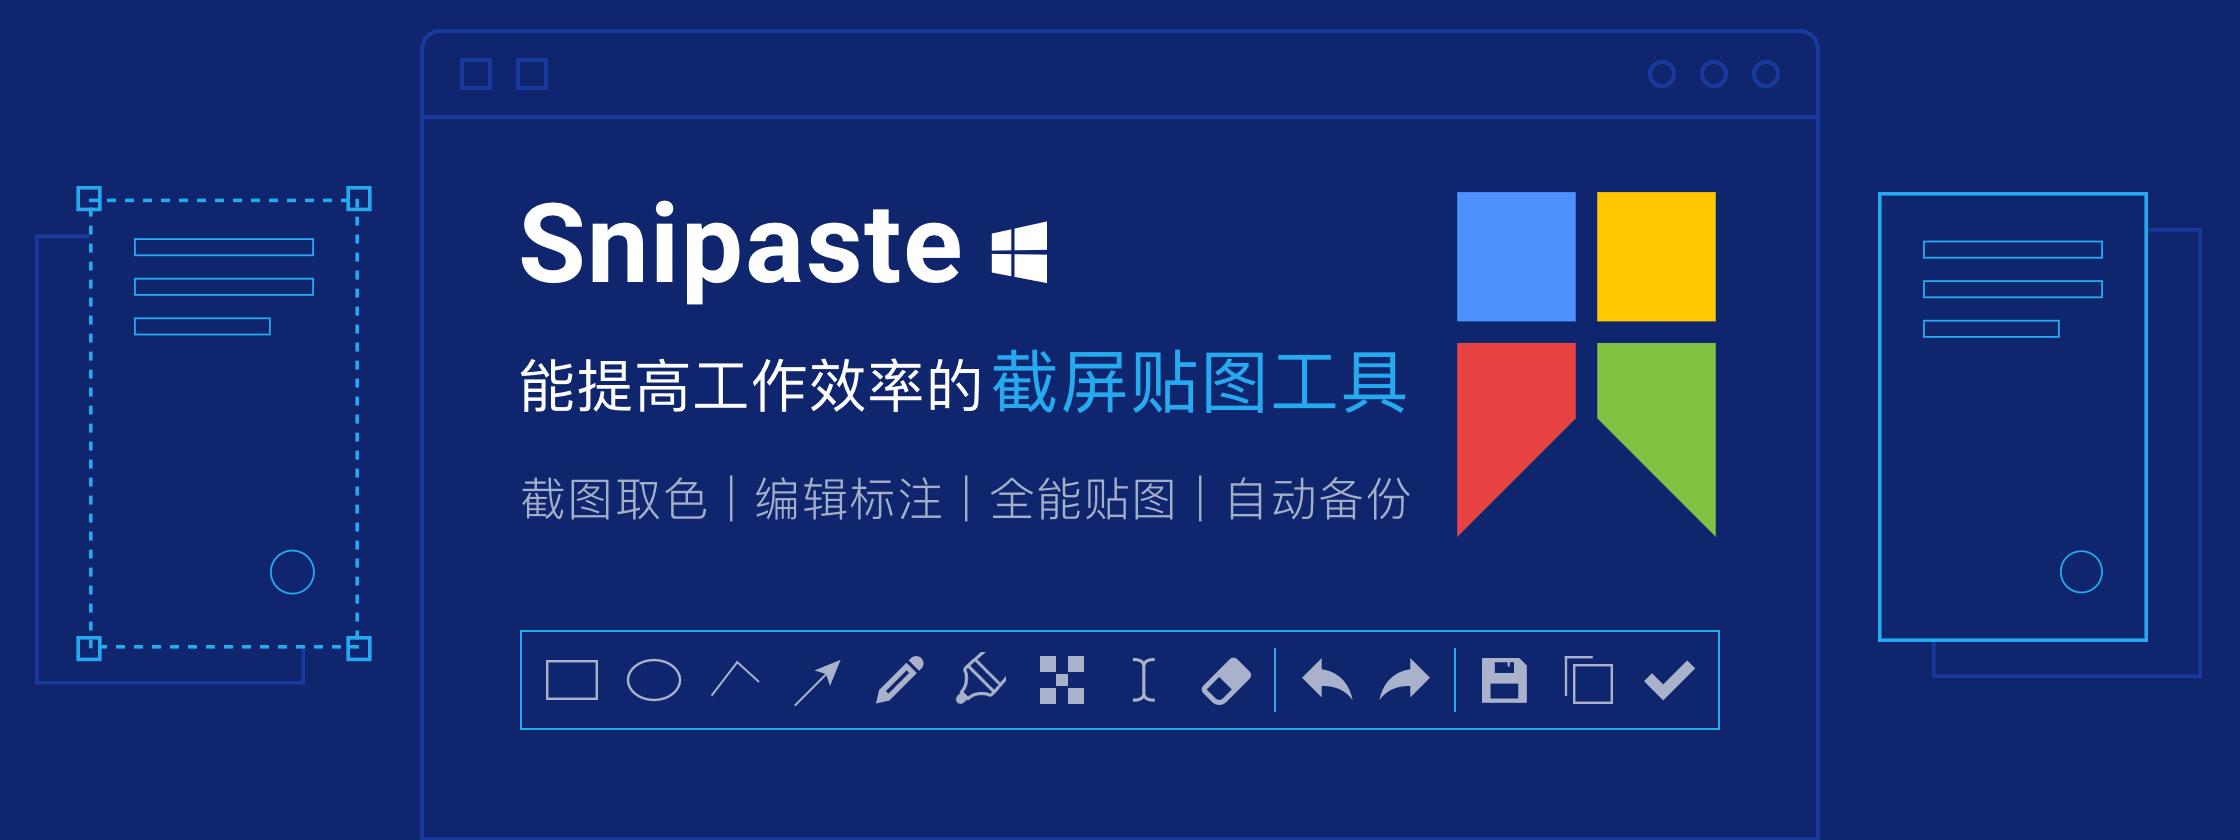 Snipaste – 实用的贴图截图工具